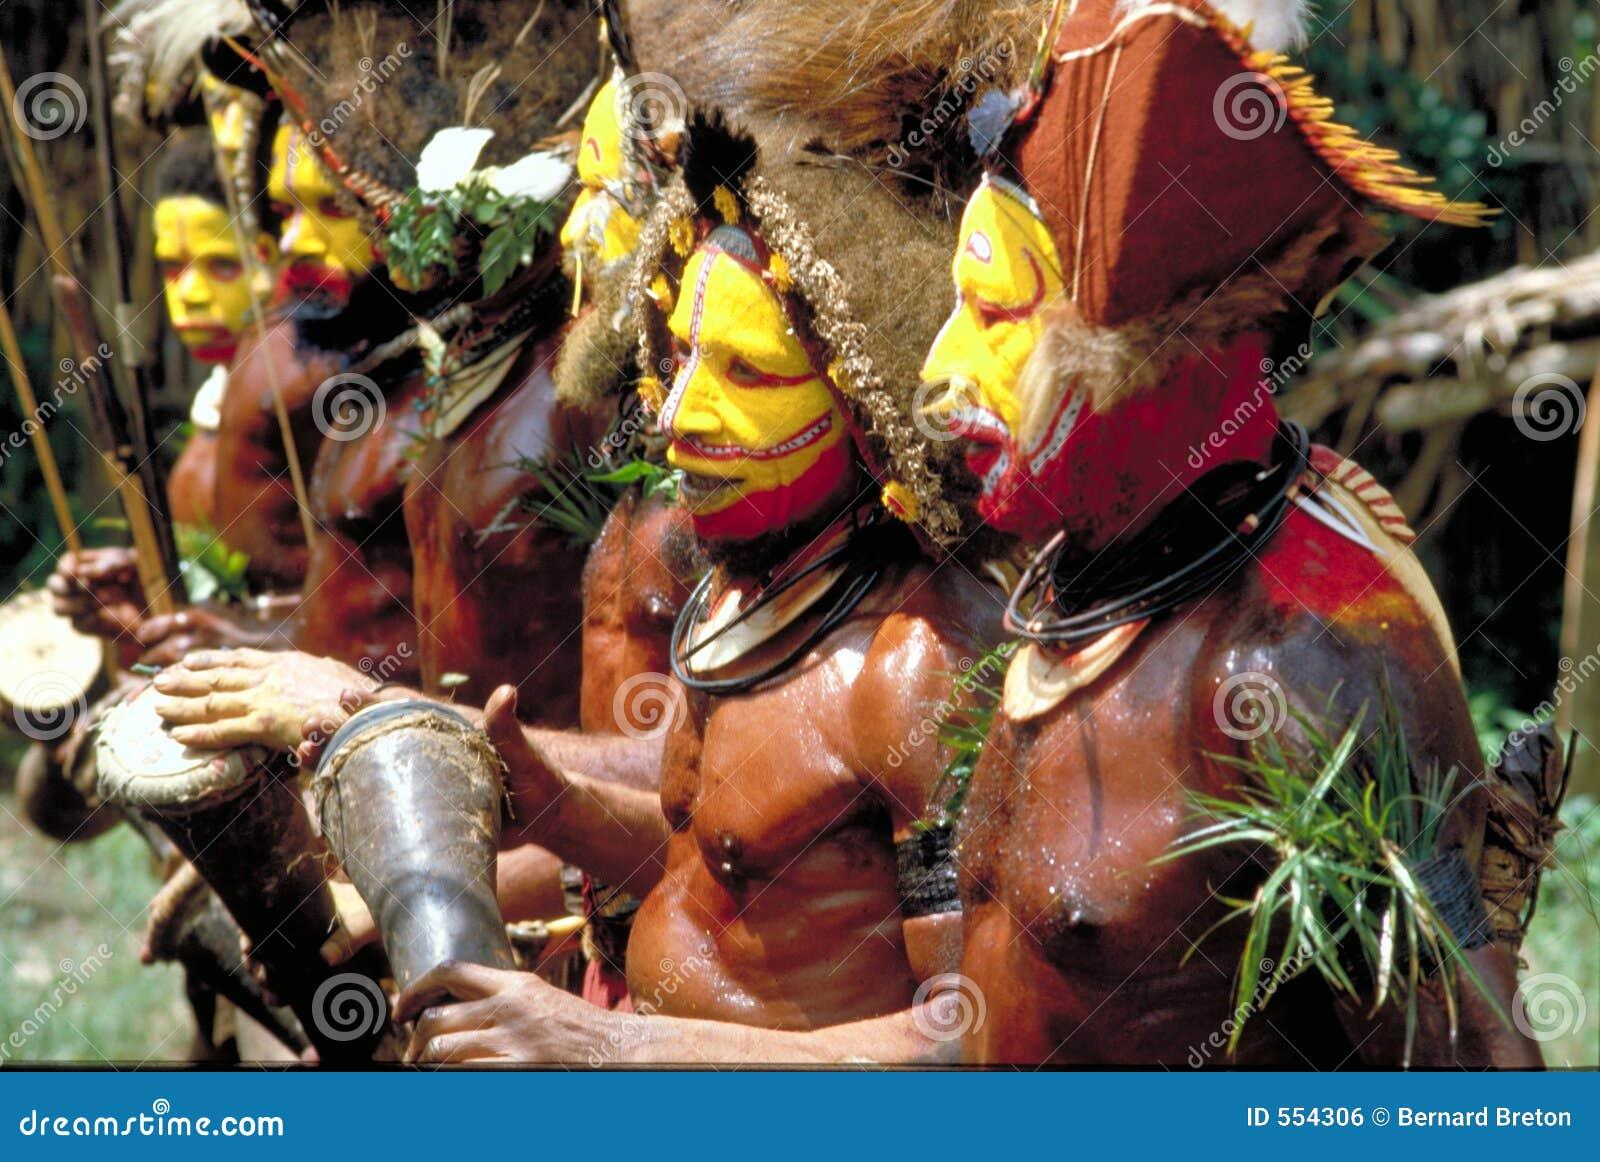 Papua New Guinea, Dance